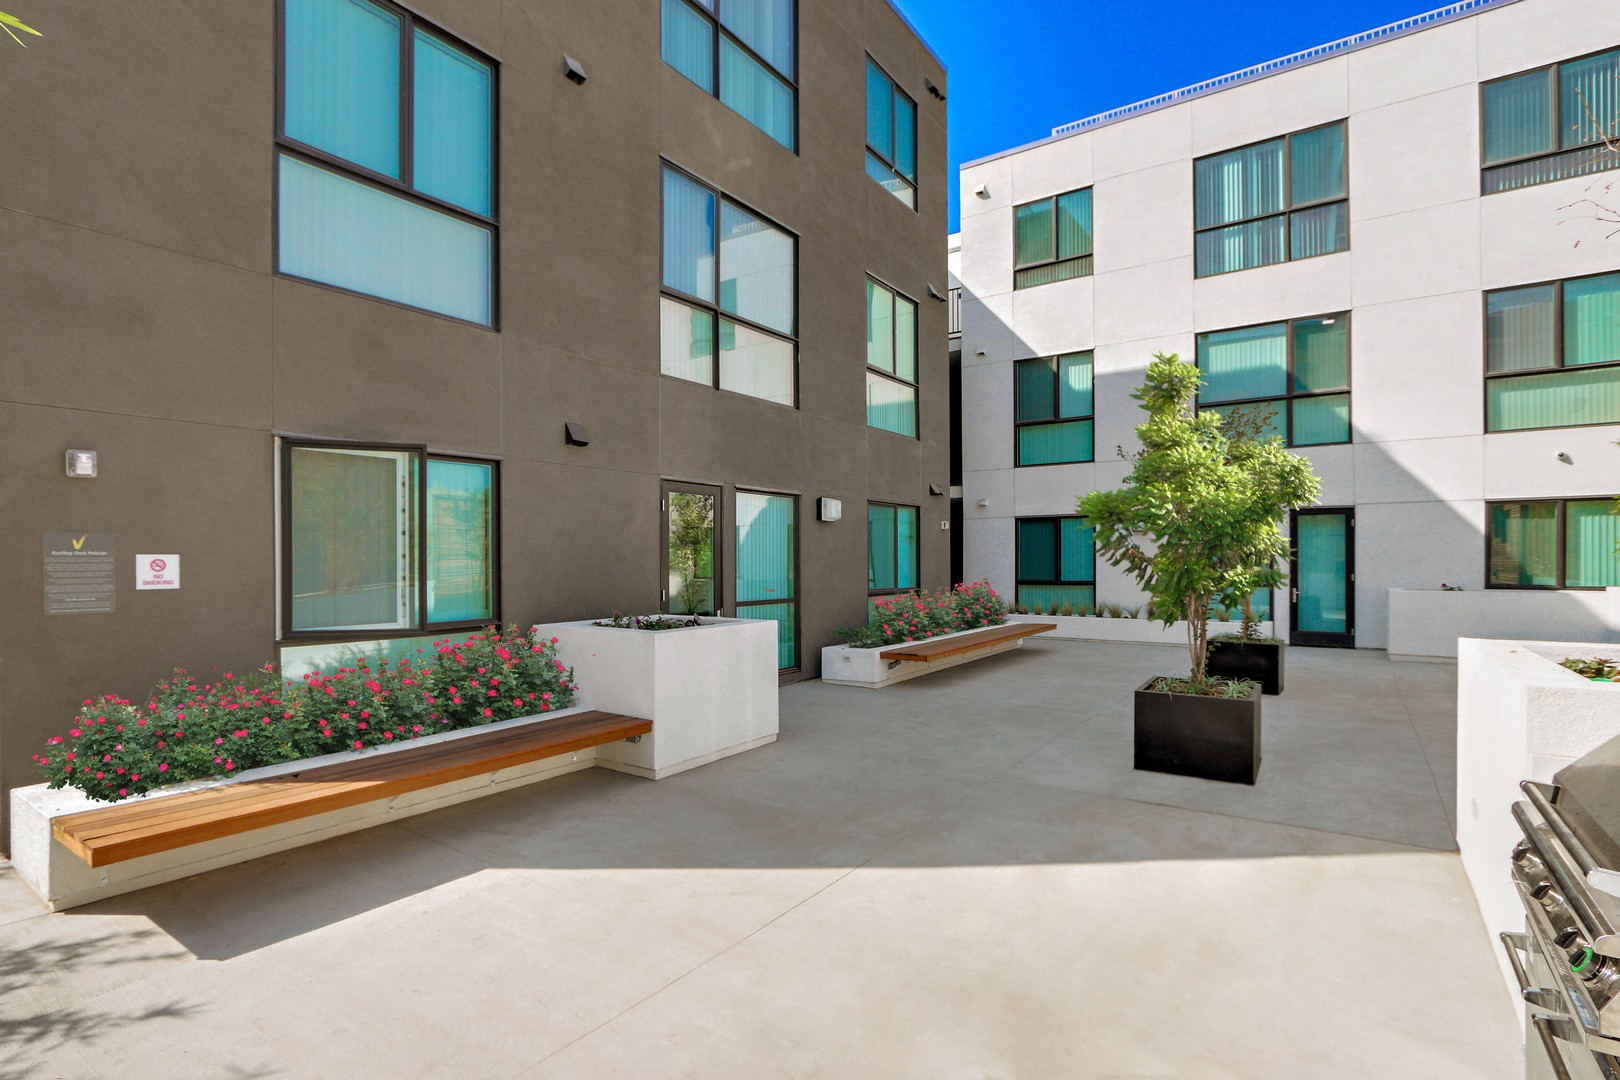 usc student housing apartments